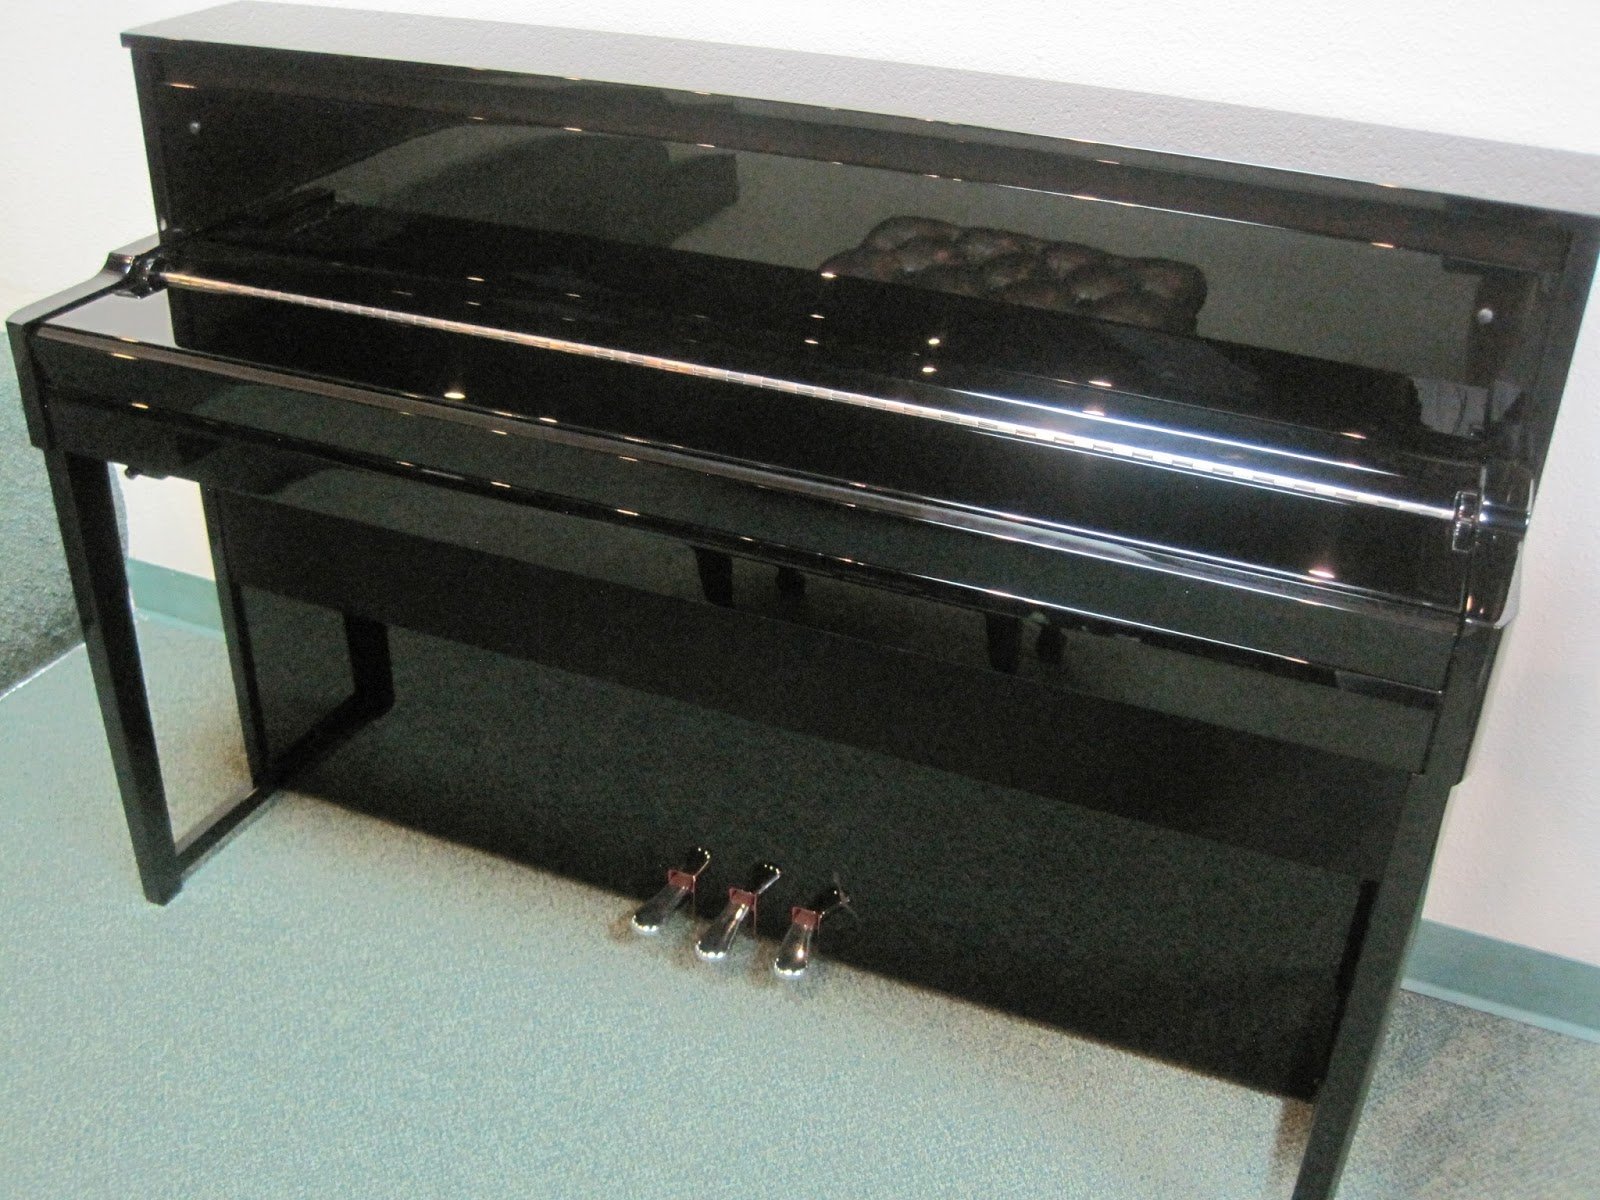 Az piano reviews review yamaha nu1 digital piano for Yamaha upright piano cover